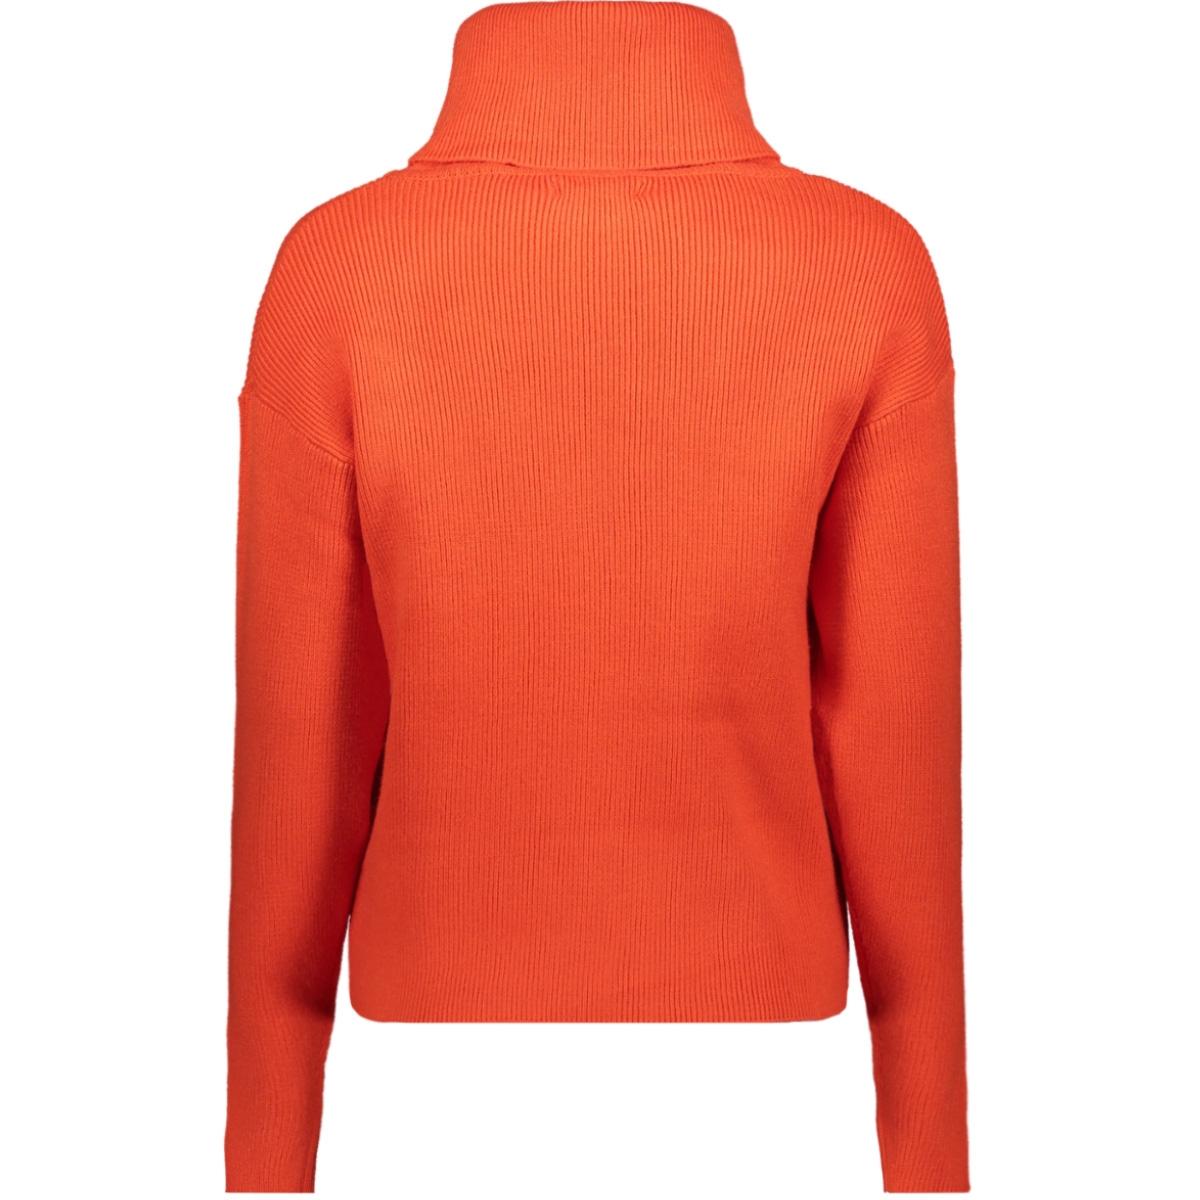 trui met colkraag j90242 garcia trui 1220 red orange